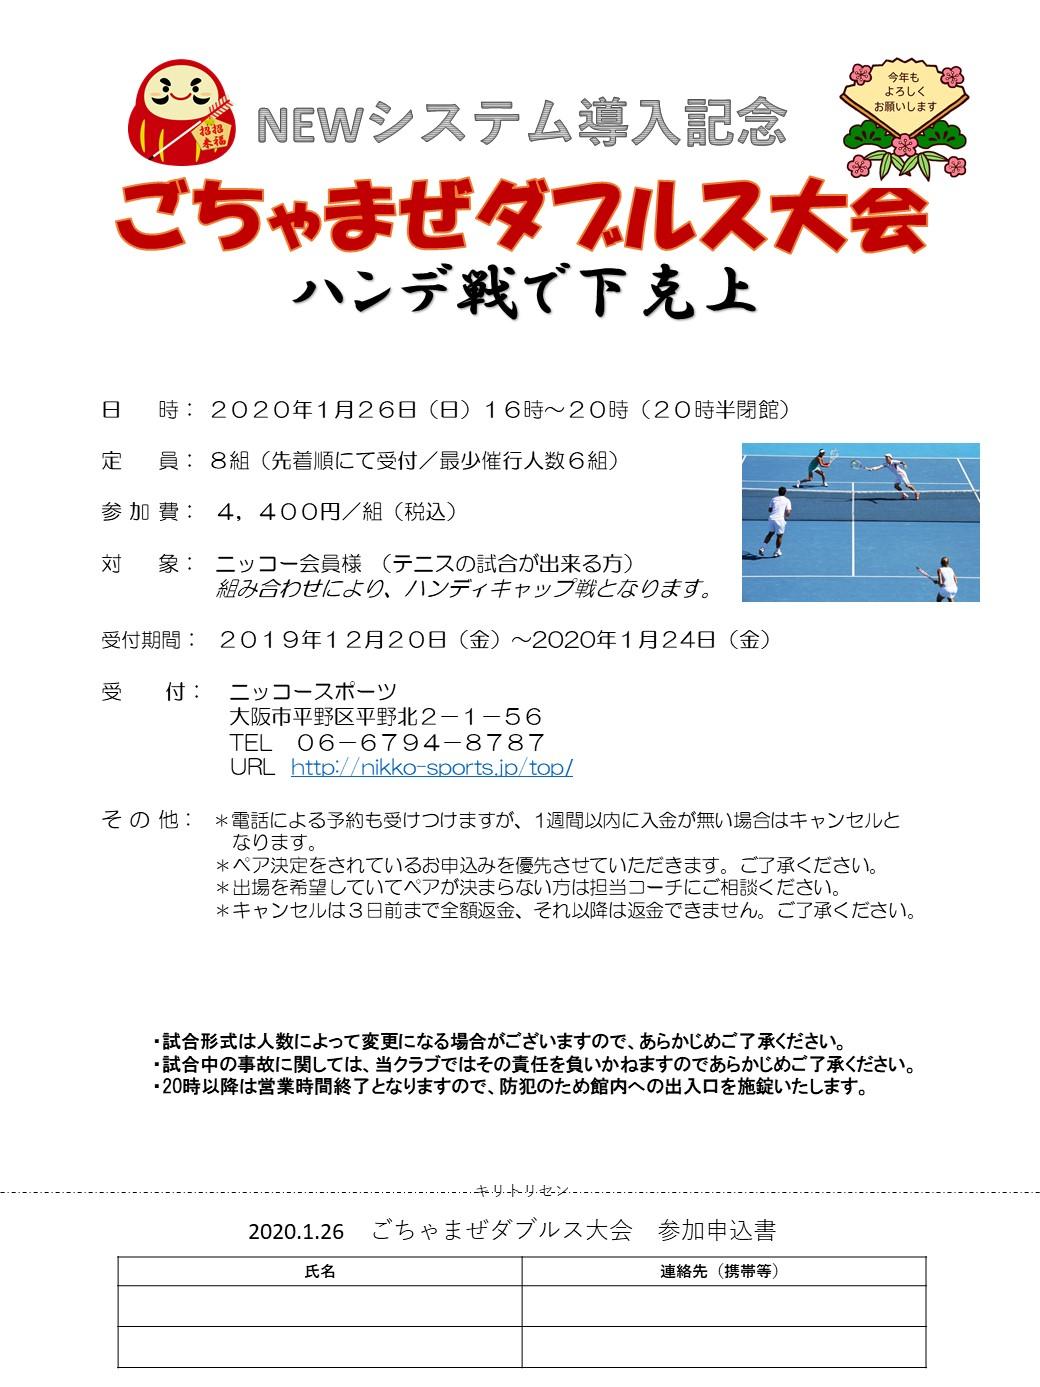 doublesmatch20200126_1.jpg